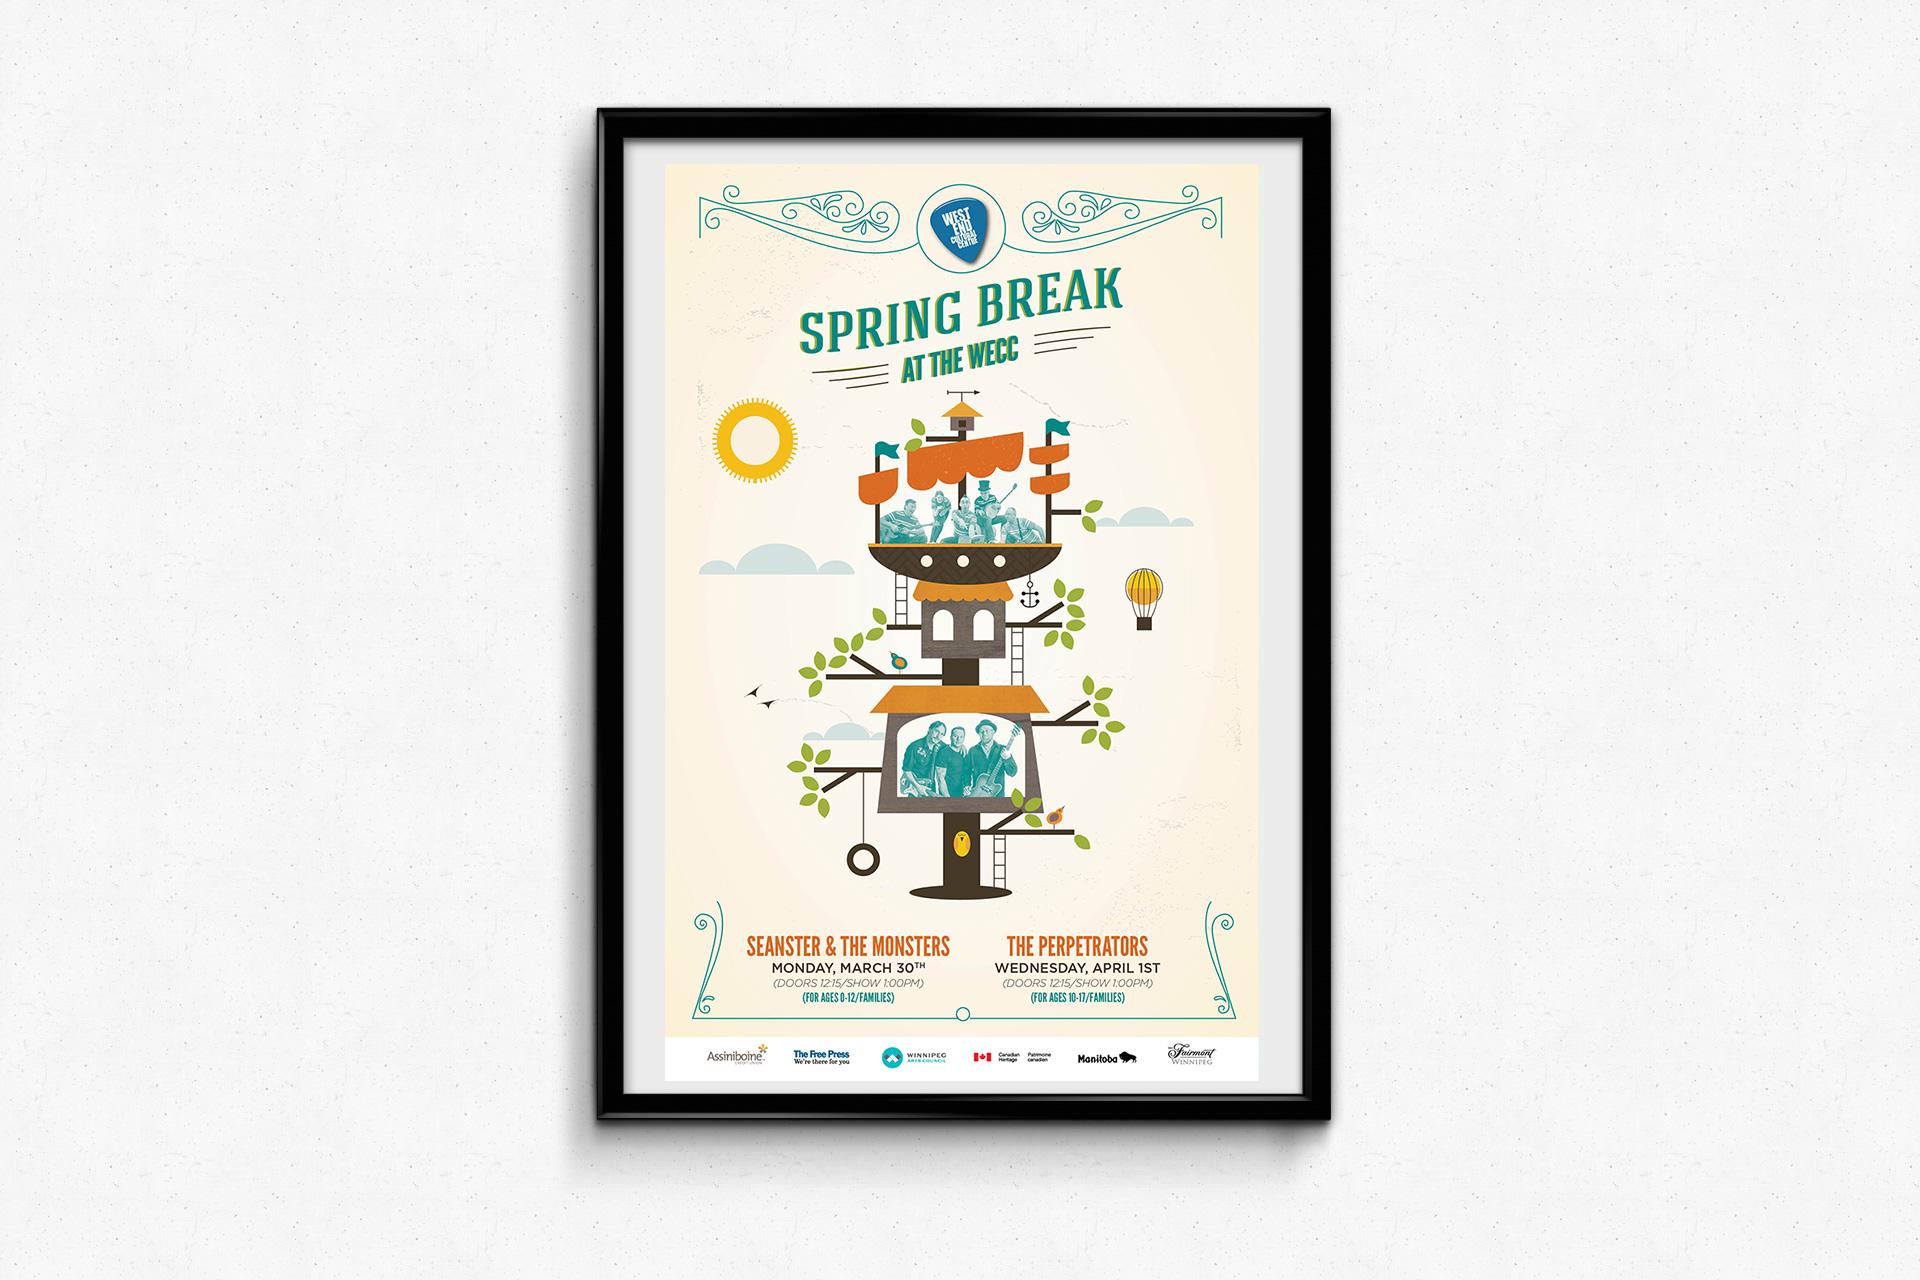 West End Cultural Centre – Spring Break